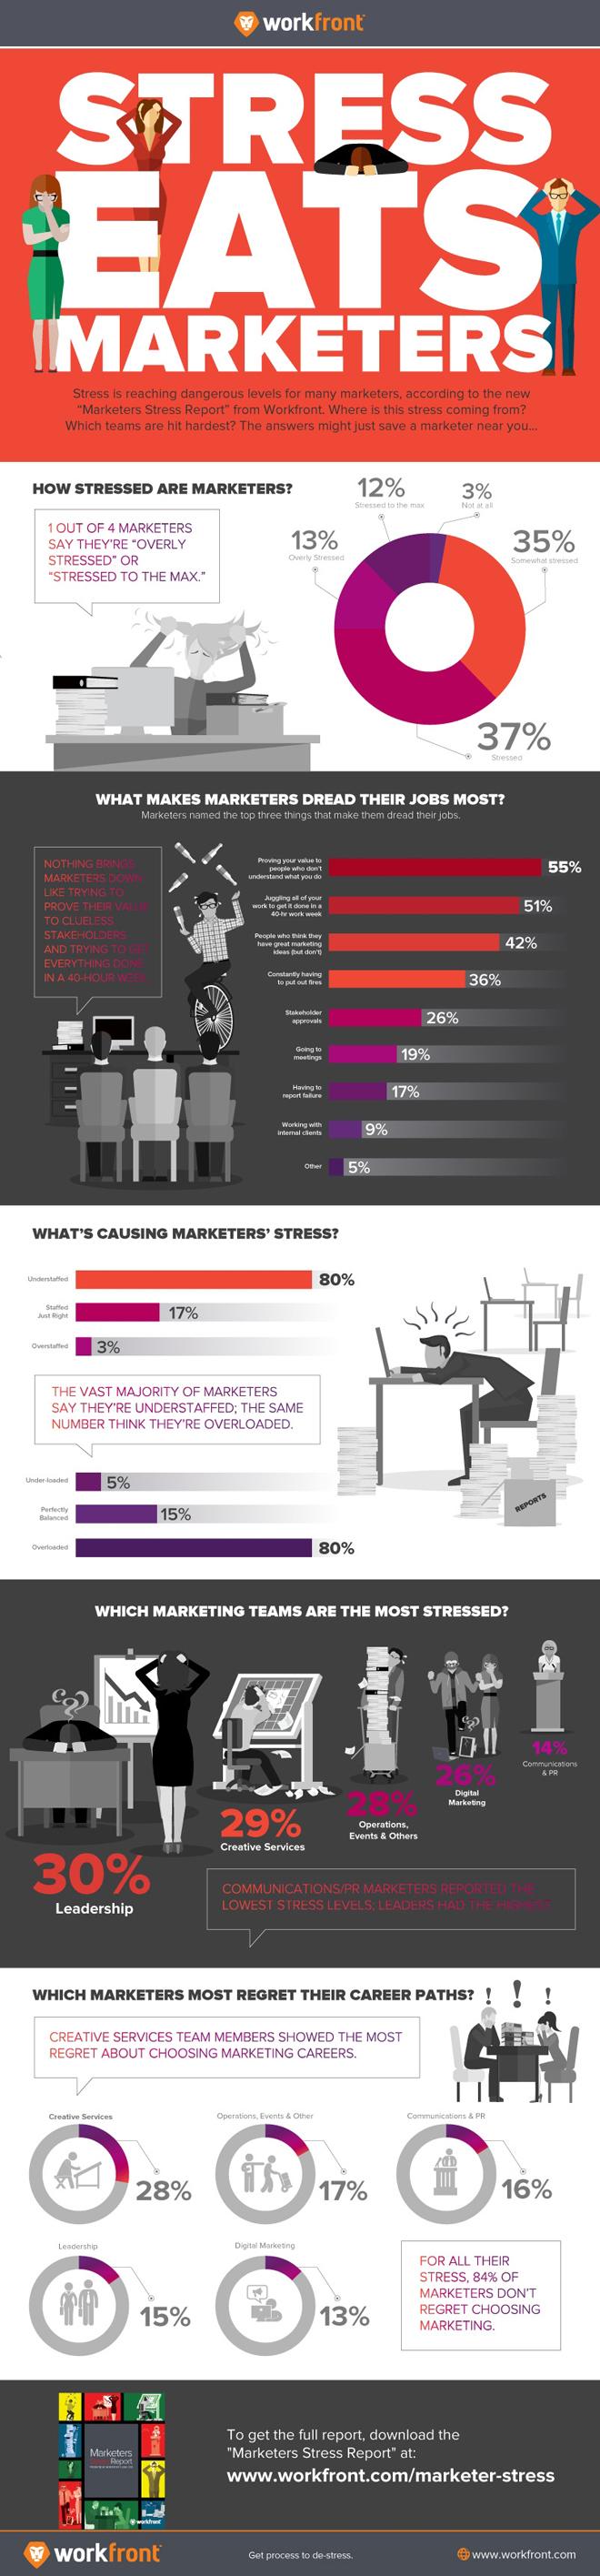 workfront_stresseatsworkplace_infographic_2015